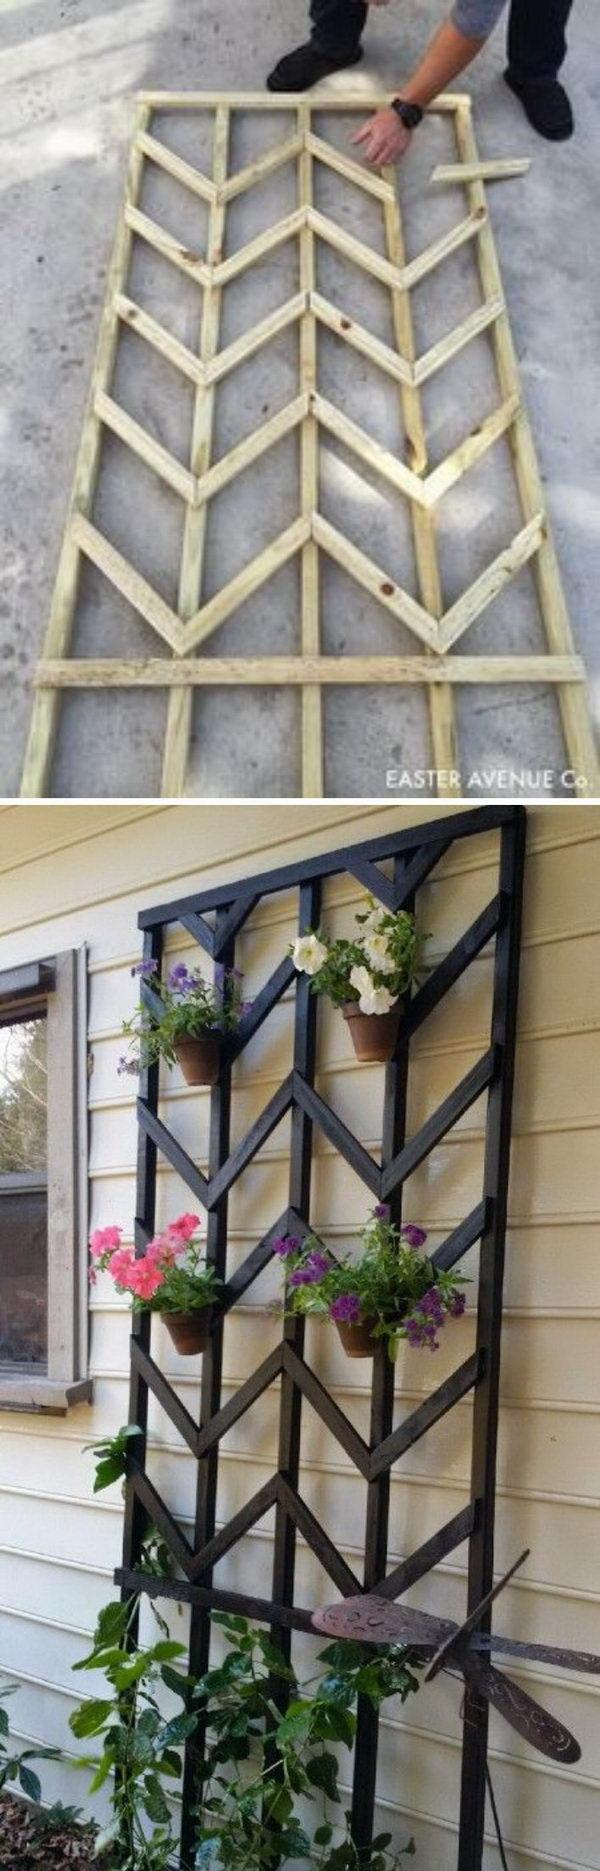 30 diy trellis ideas for your garden 2017 diy chevron lattice trellis with tutorial solutioingenieria Image collections